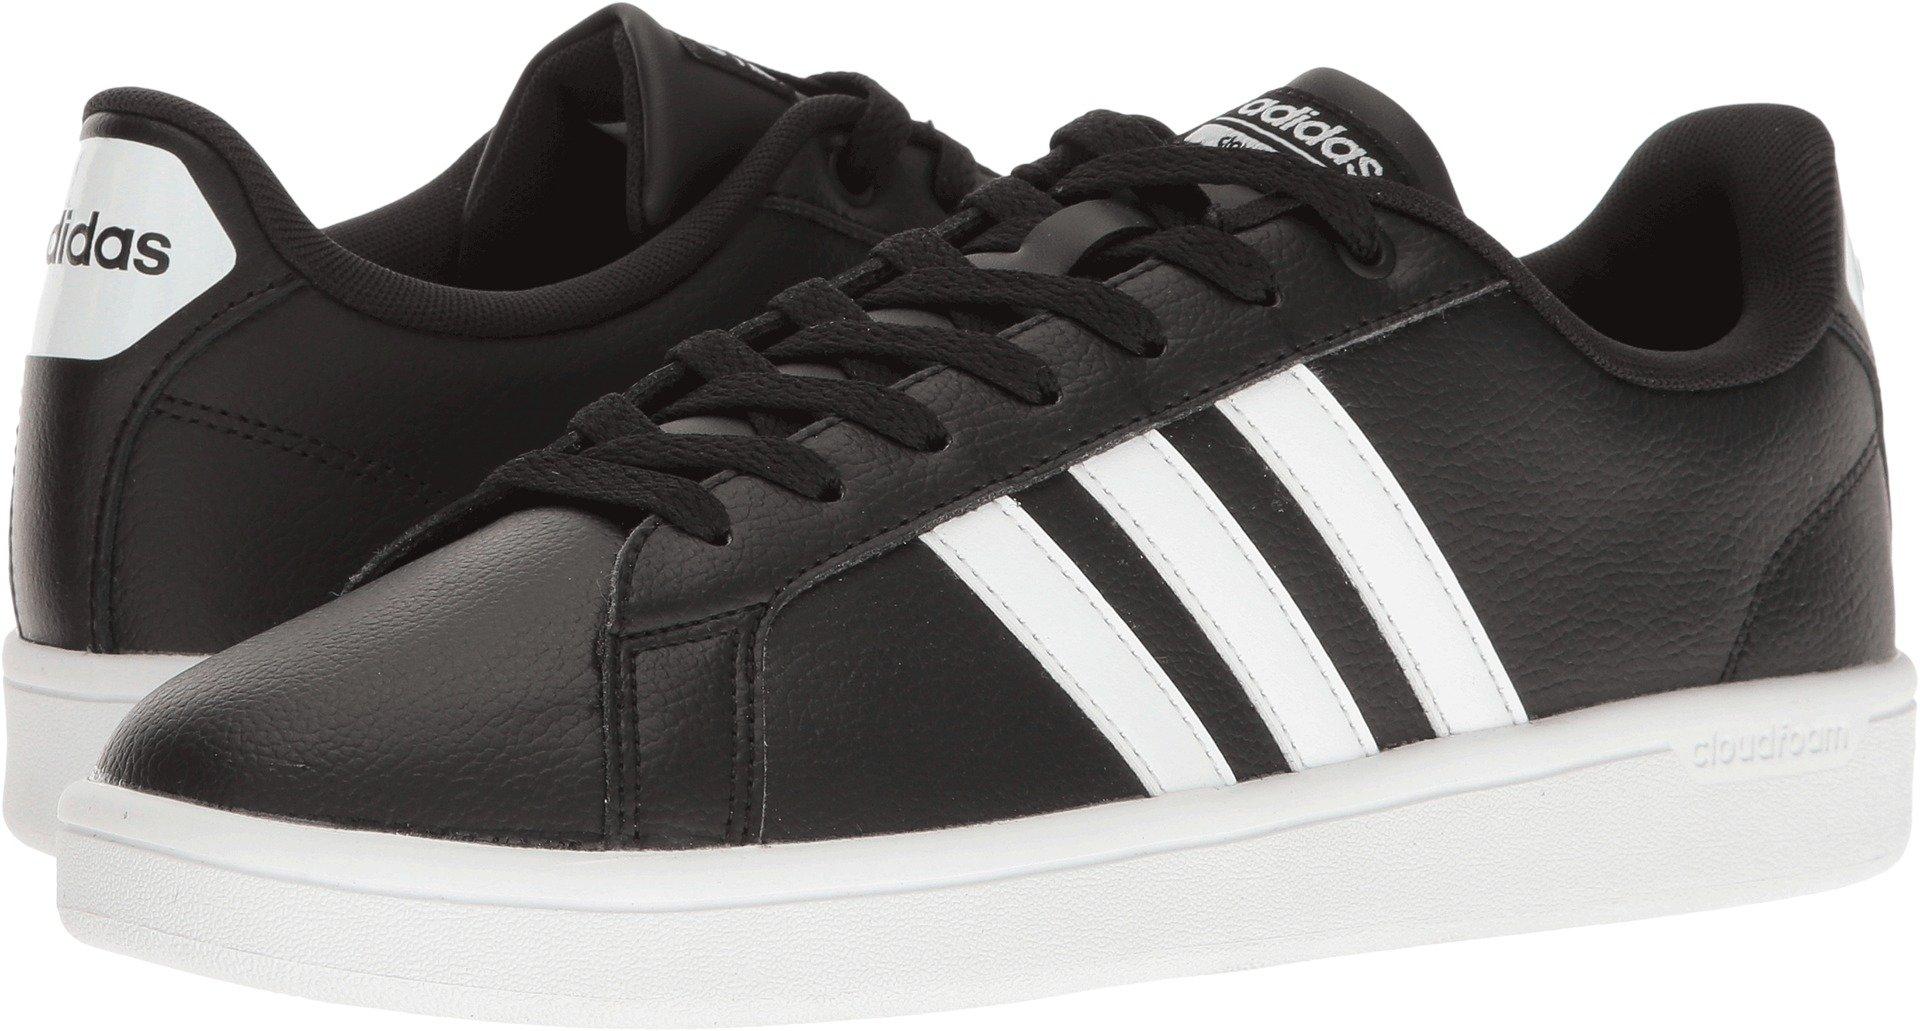 adidas Women's Shoes | Cloudfoam Advantage Sneakers White/Black, (6 M US)